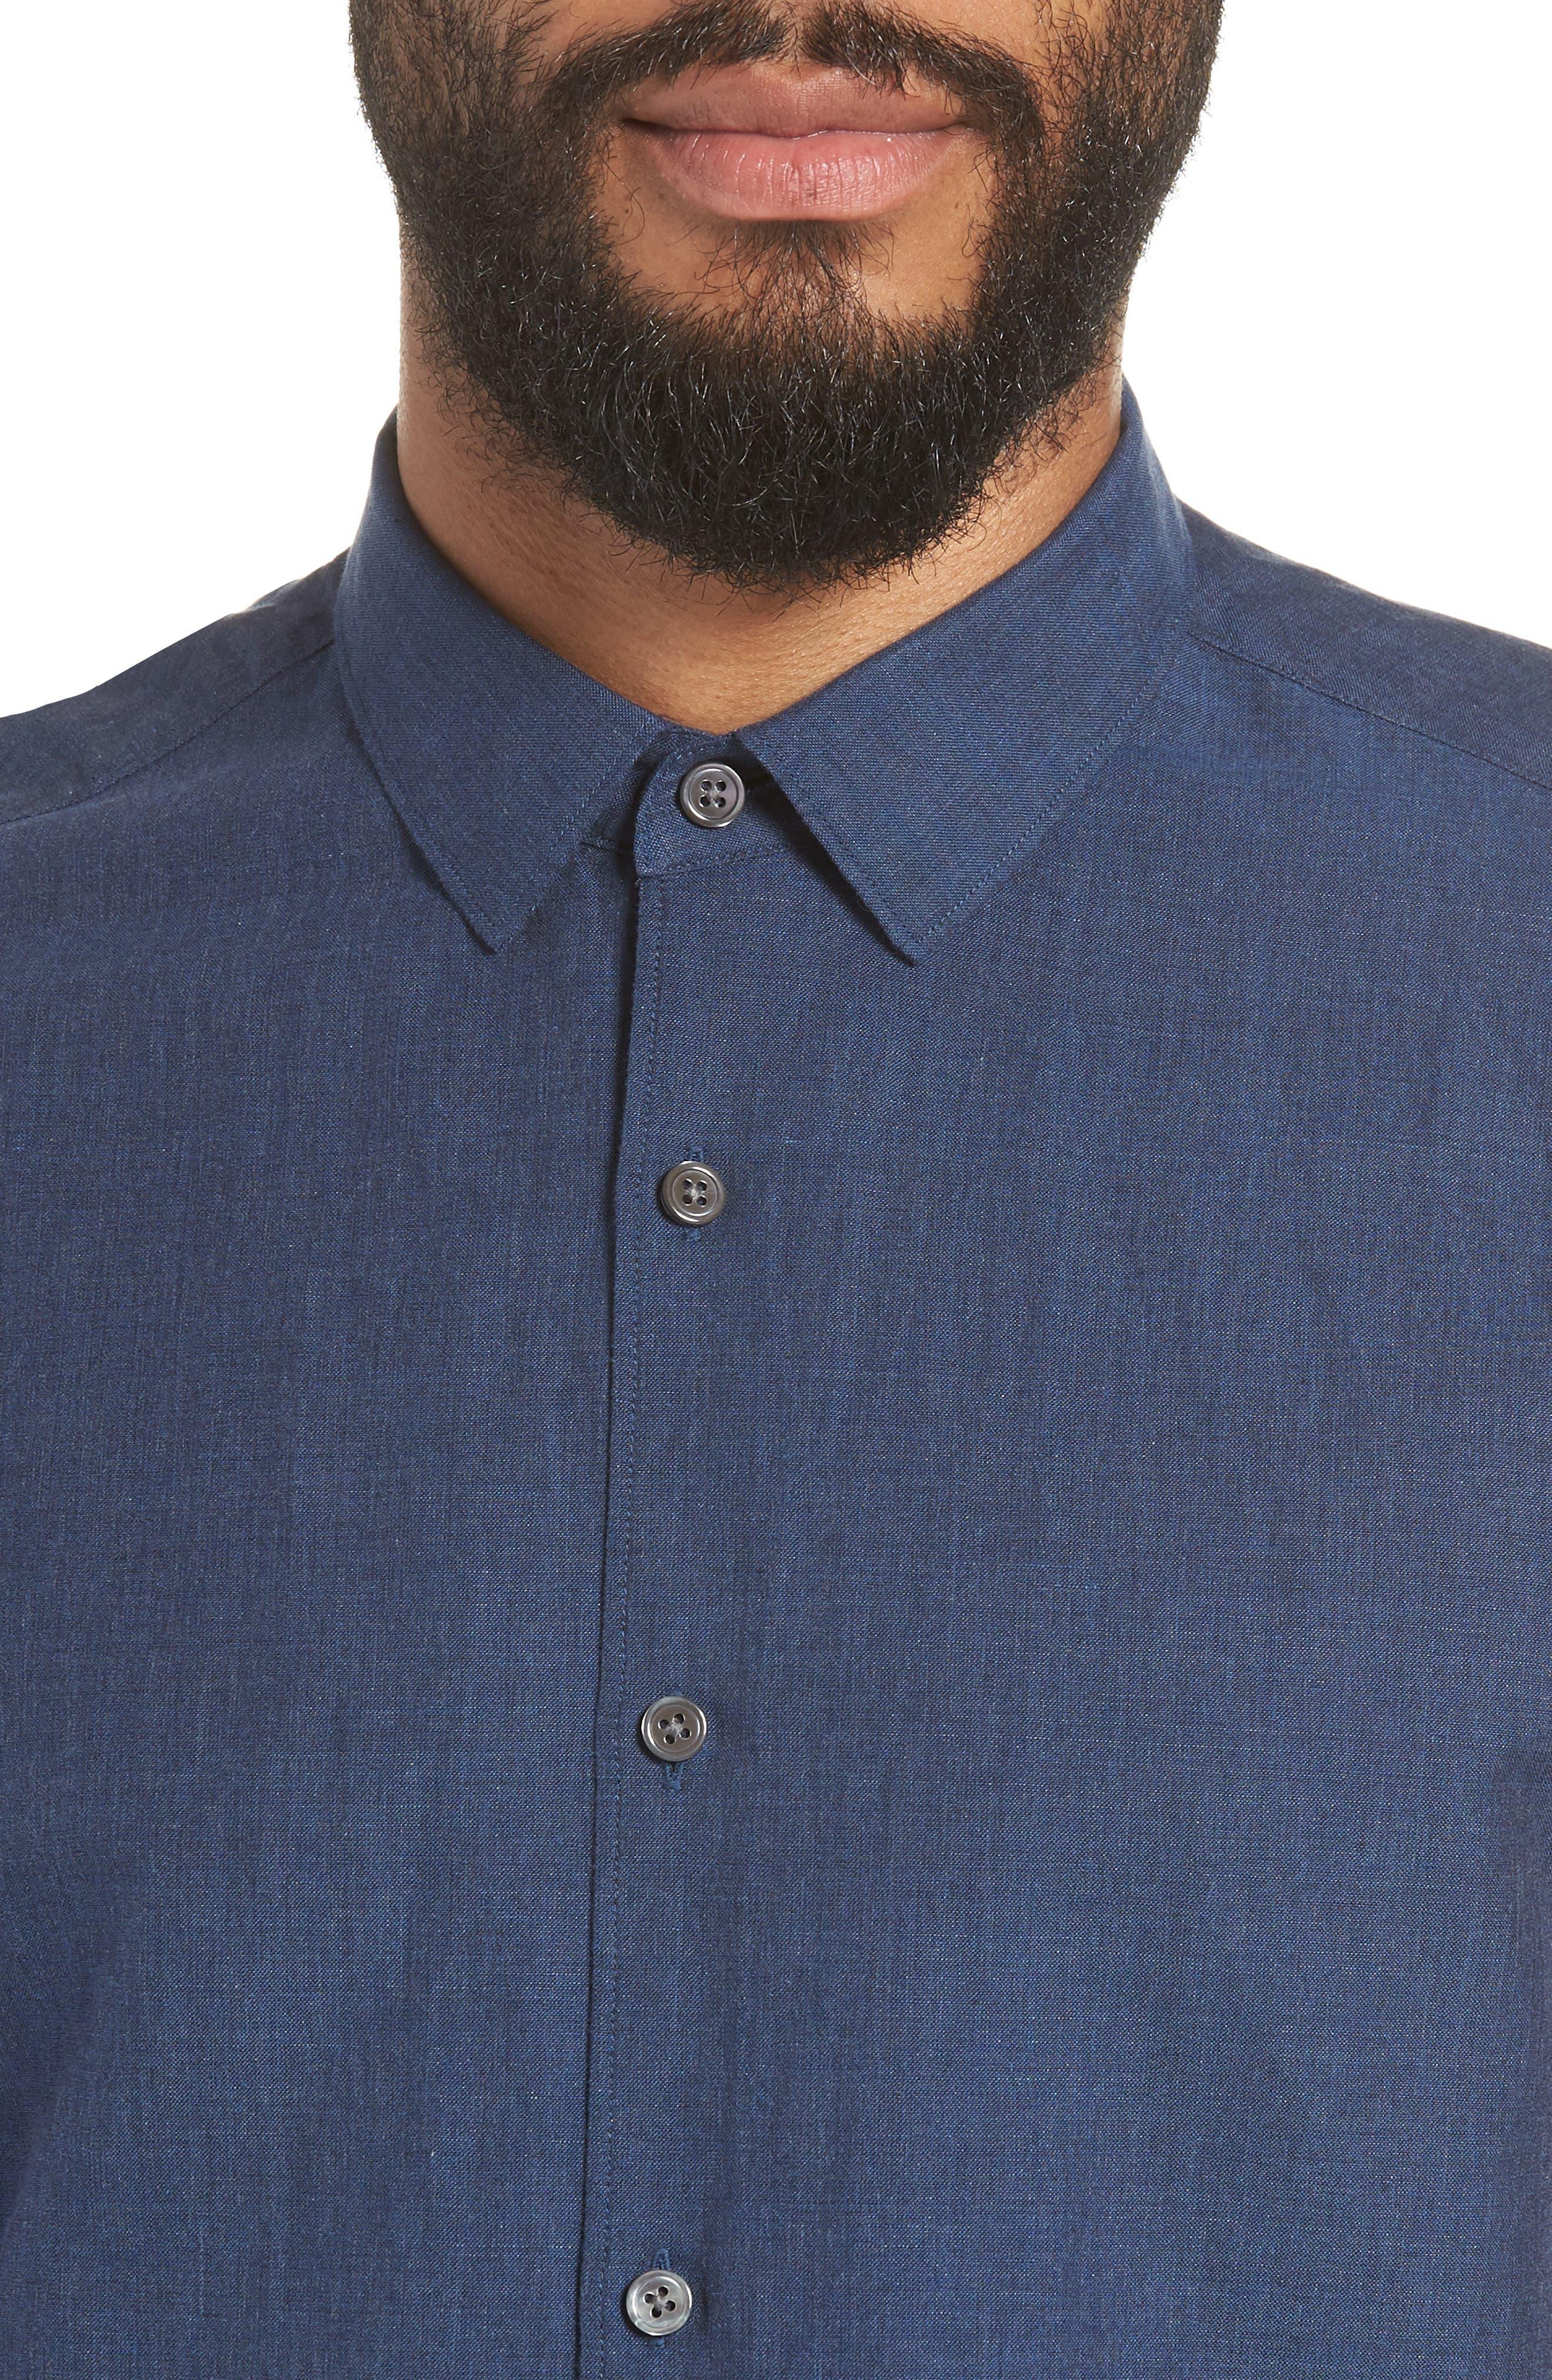 Murrary Indy Regular Fit Solid Cotton & Linen Sport Shirt,                             Alternate thumbnail 2, color,                             FINCH